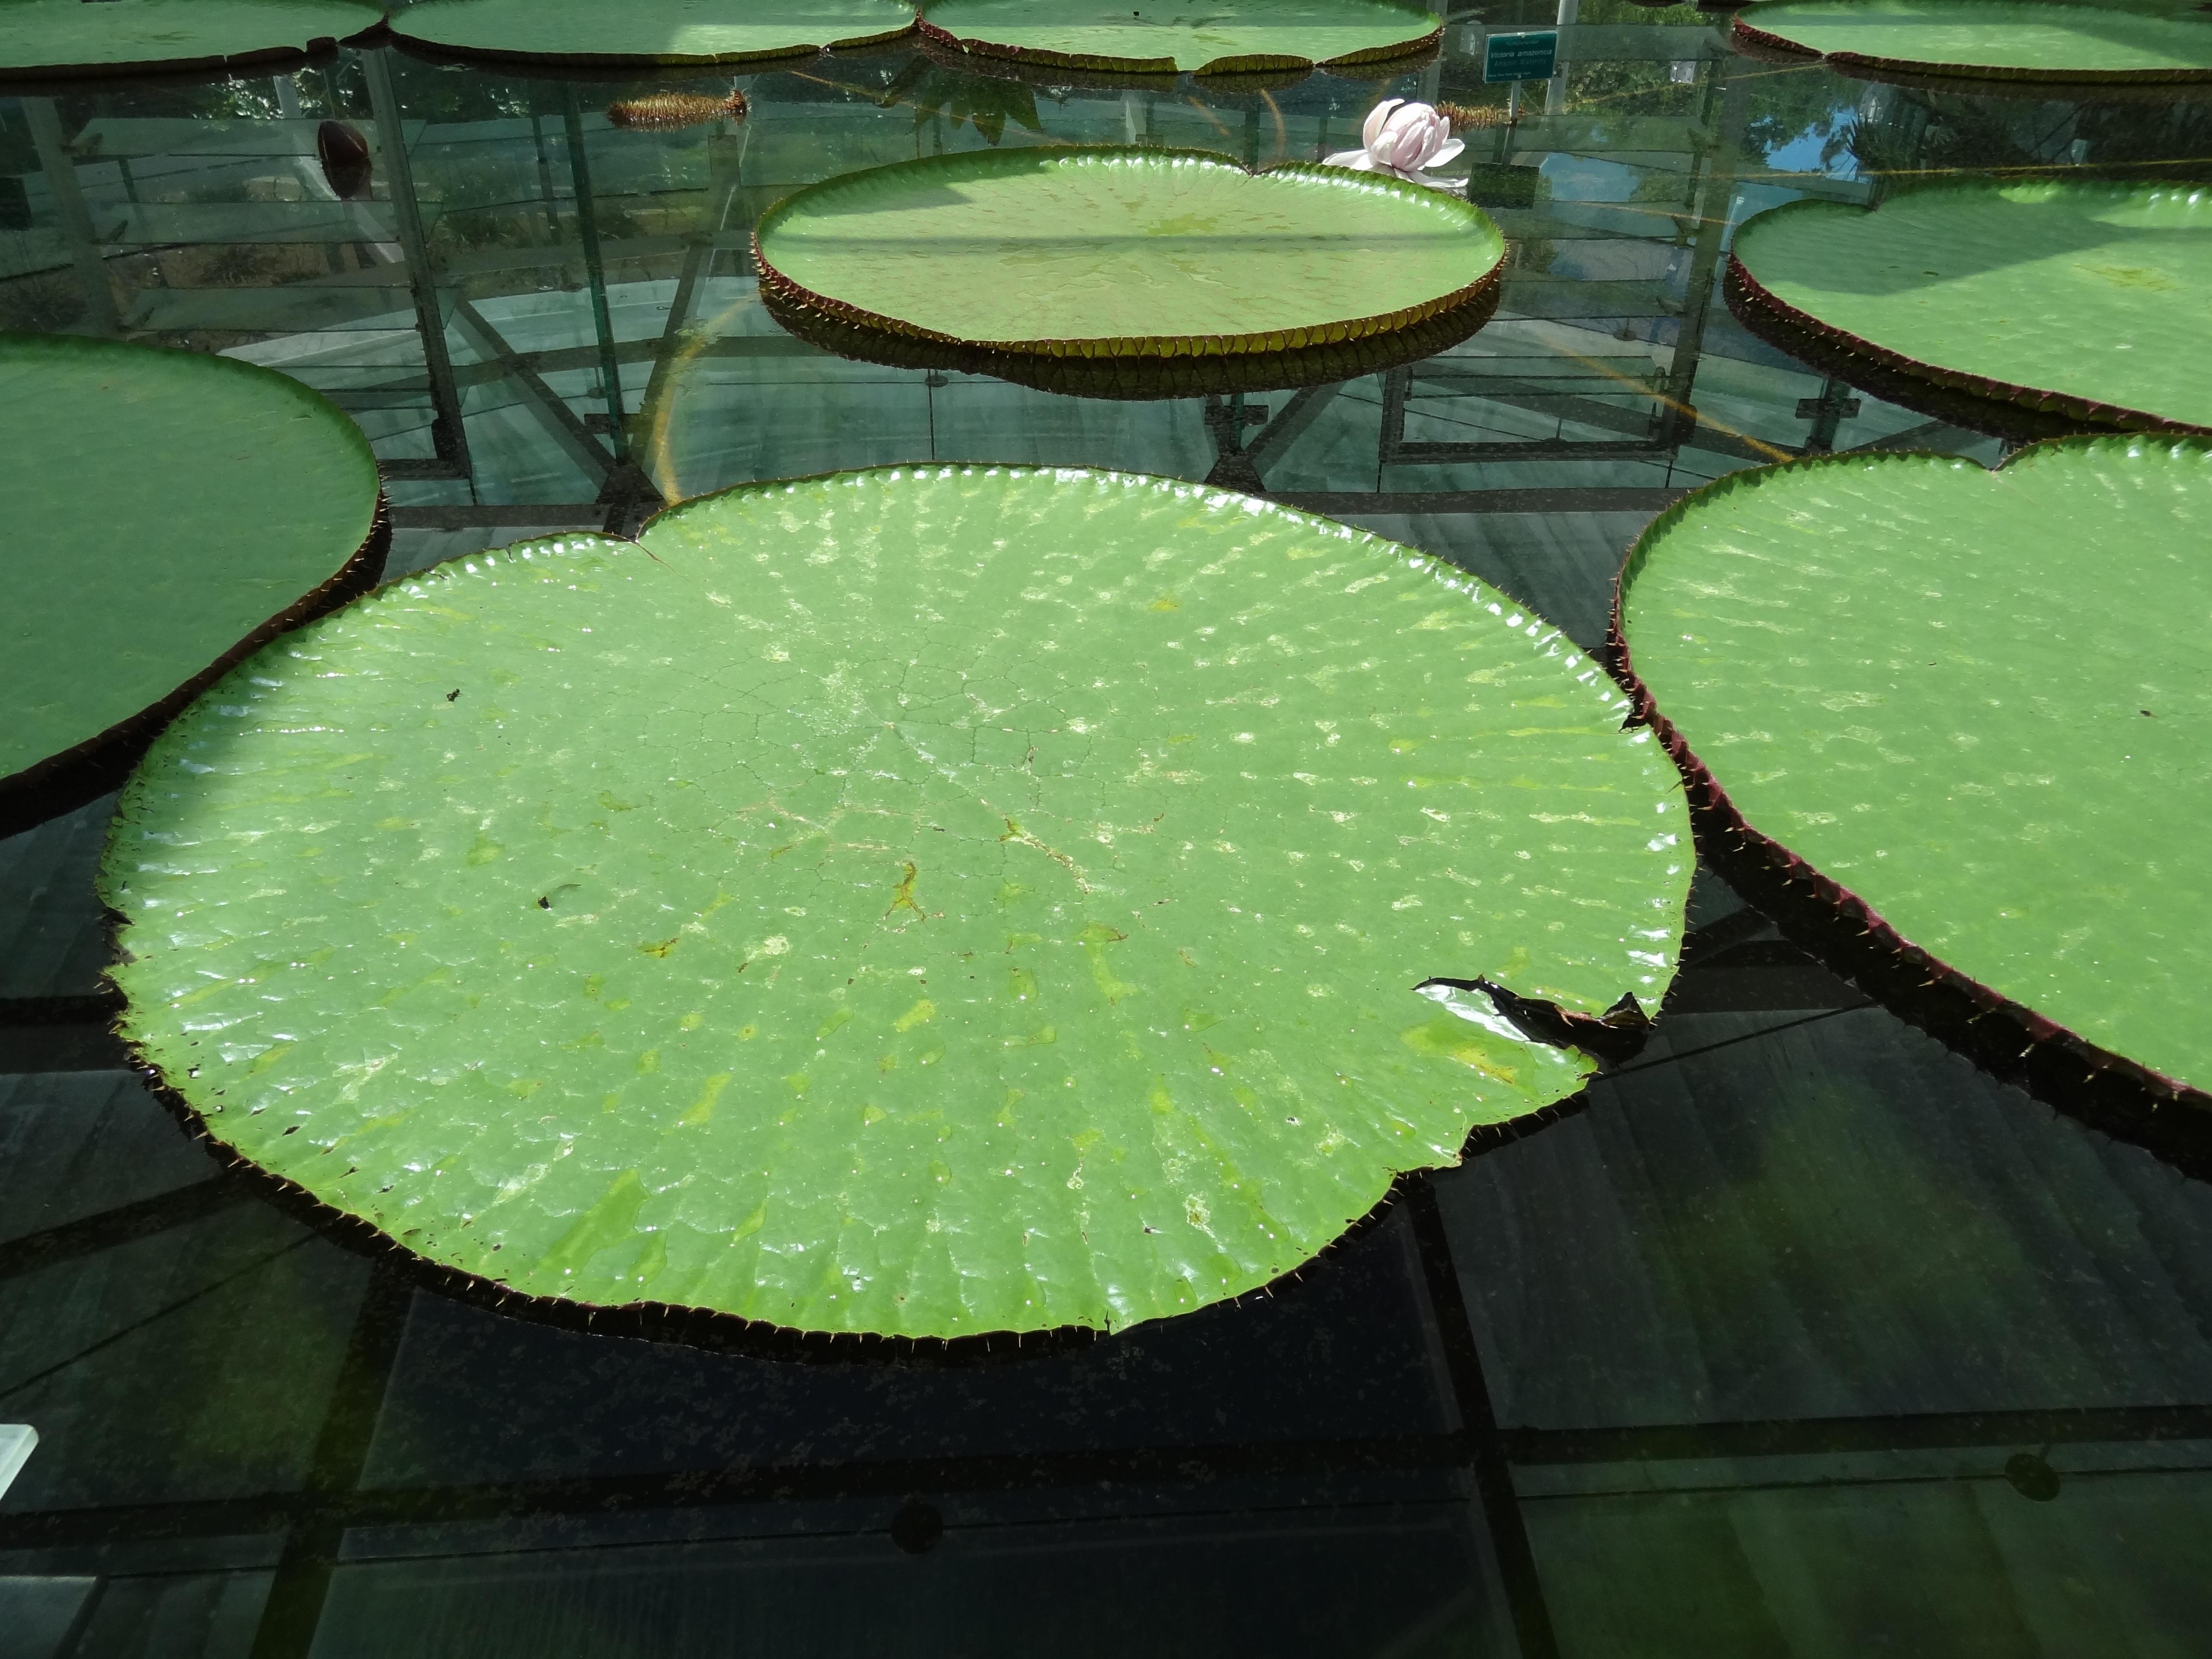 Fotos gratis c sped hoja flor lago verano estanque for Agua verde estanque